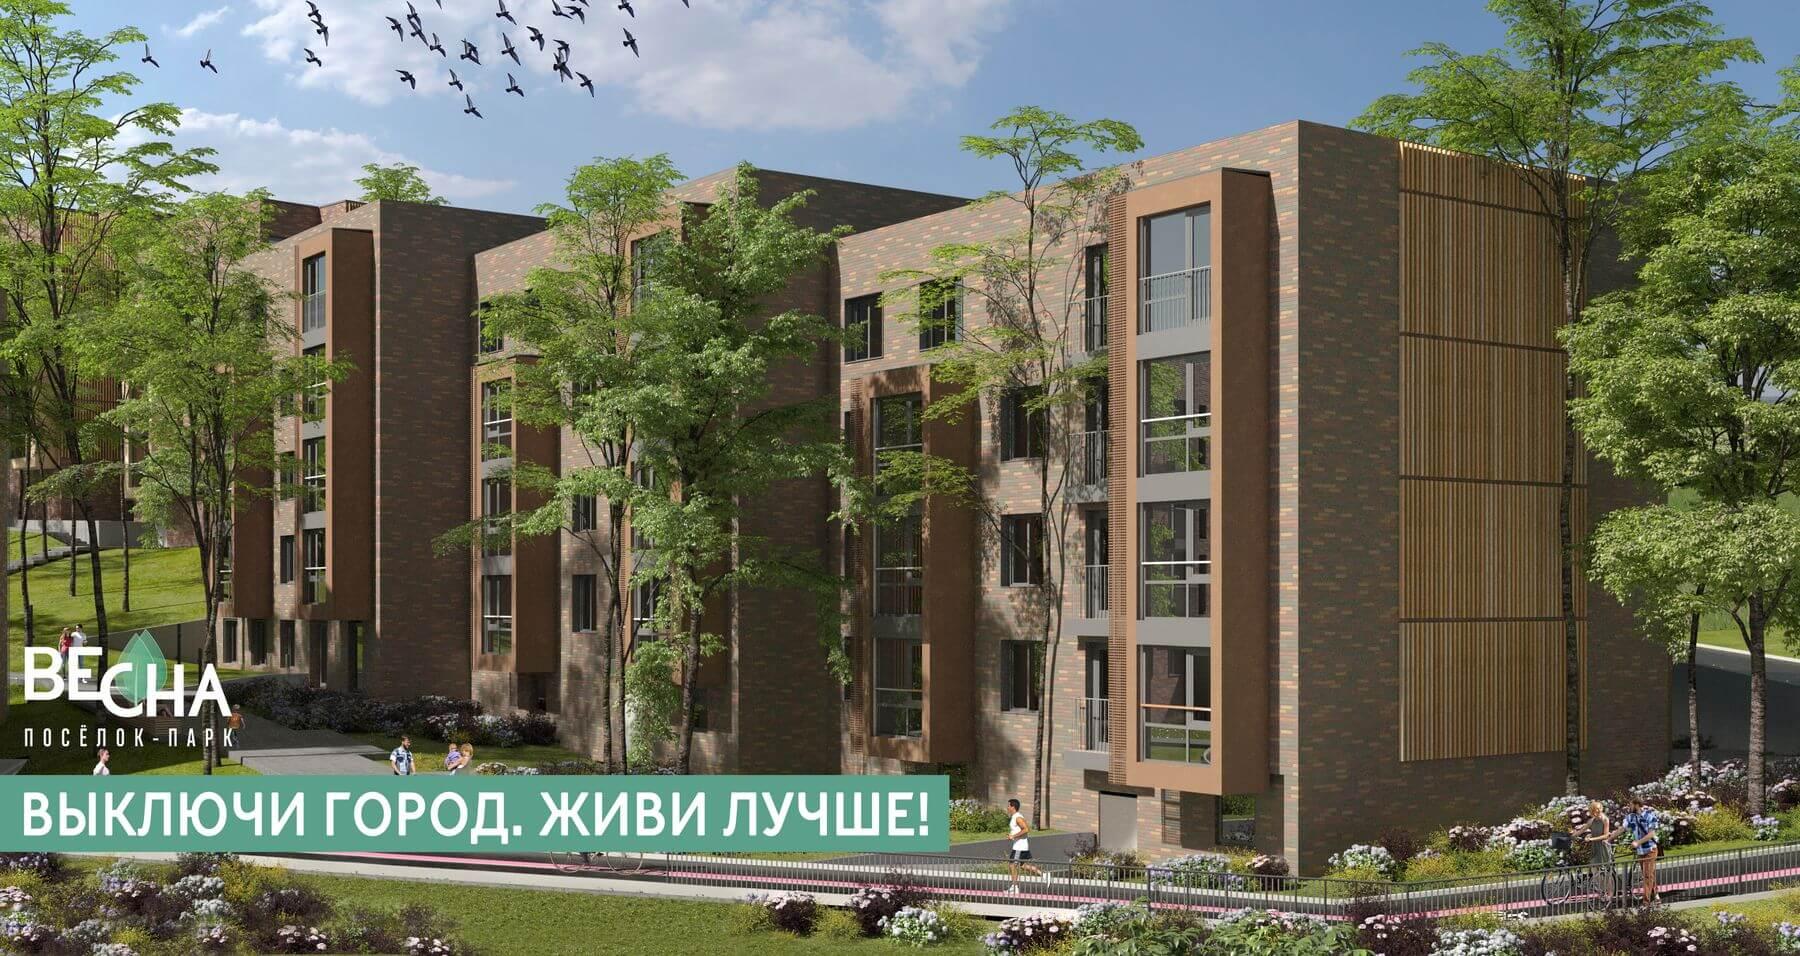 Посёлок-парк ВЕСНА